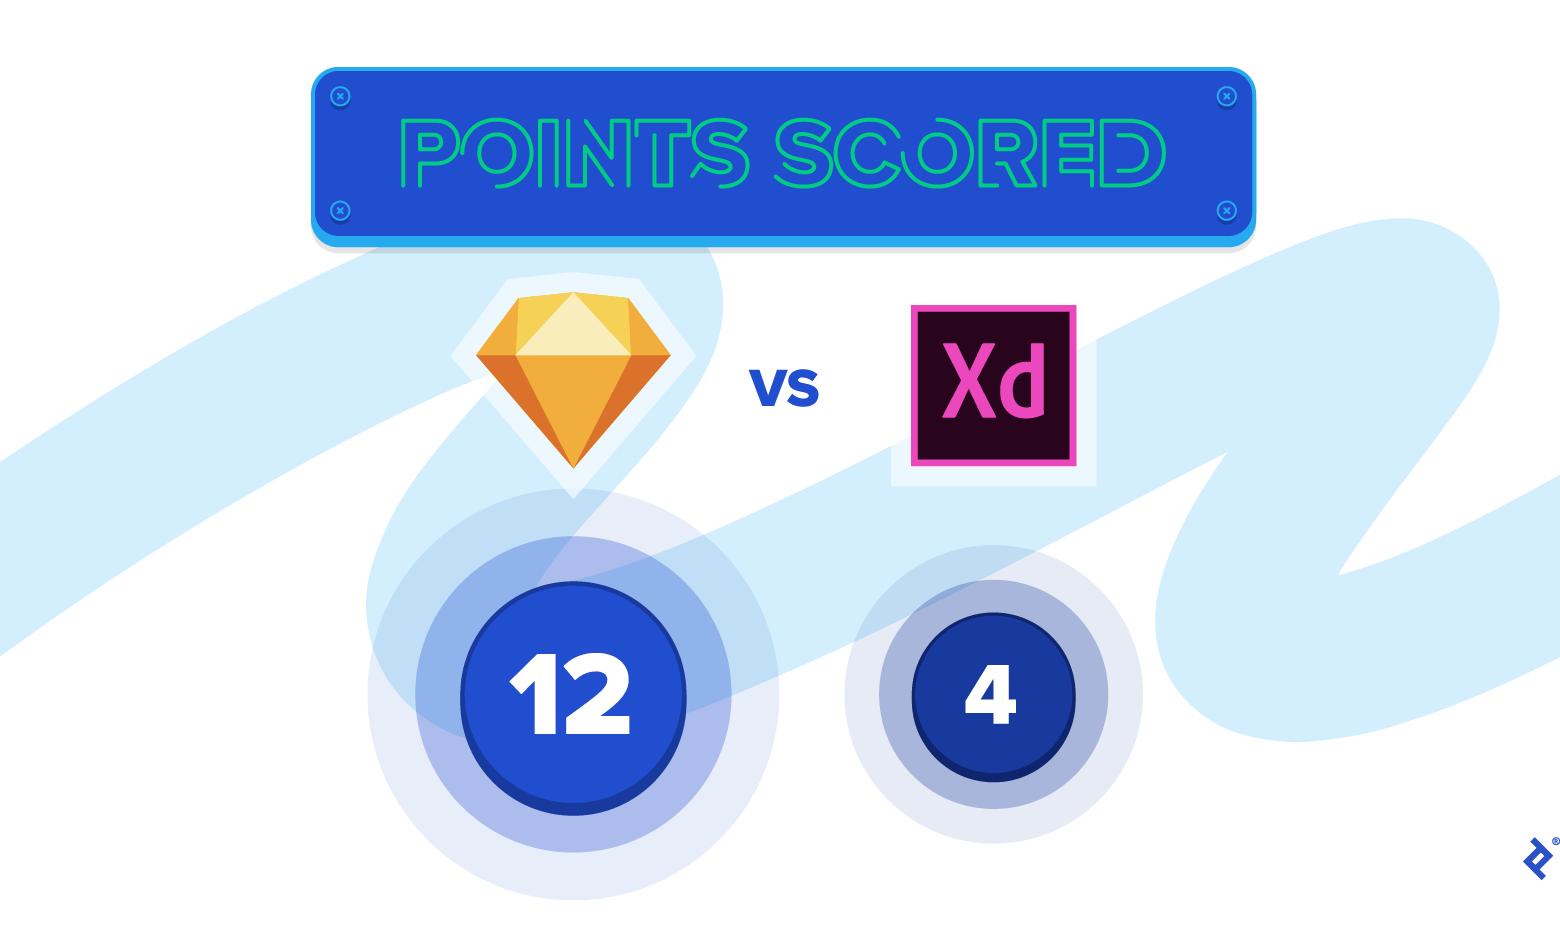 Adobe XD vs Sketch final score: Sketch wins